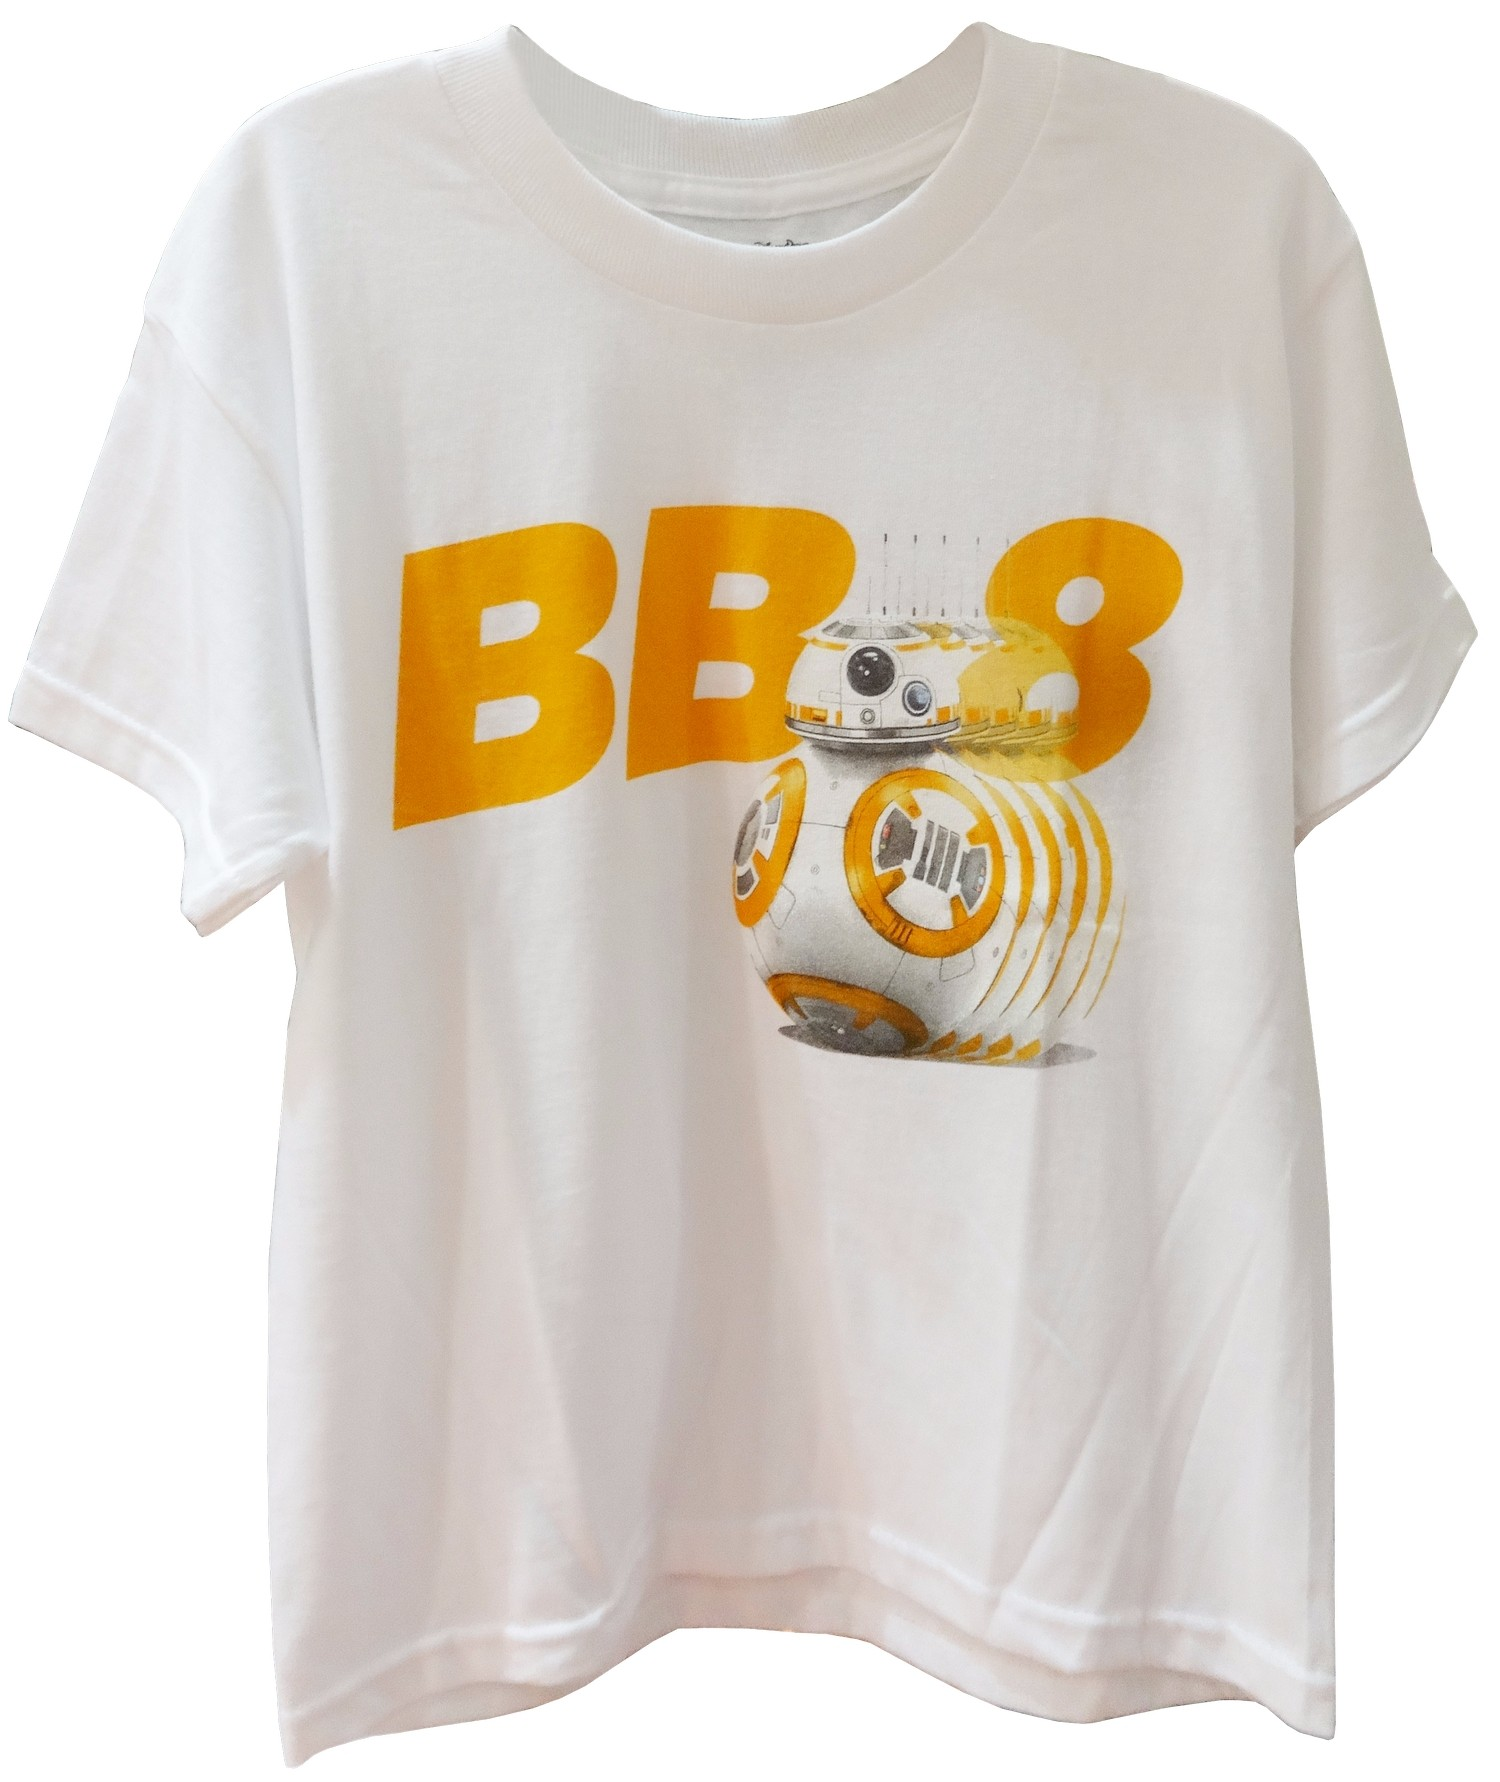 BB-8 Youth T-Shirt (Tshirt, T shirt or Tee) from Disney Star Wars: The Force Awakens © Dizdude.com